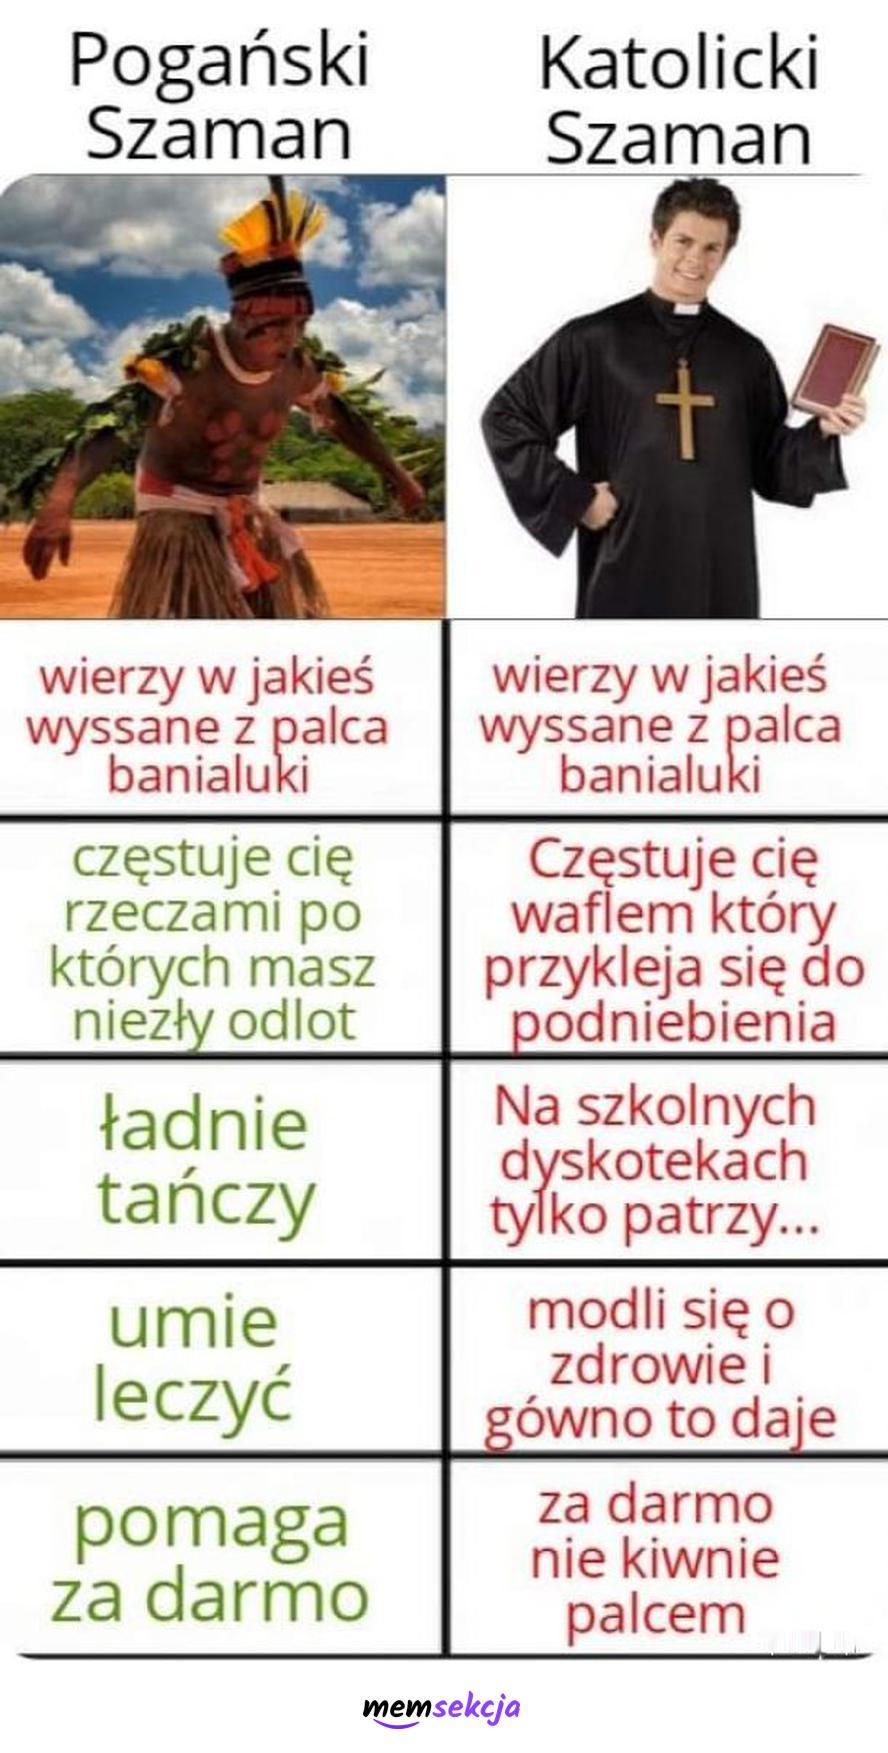 Pogański Szaman vs Katolicki Szaman. Memy. Katolik. Szaman. Poganie